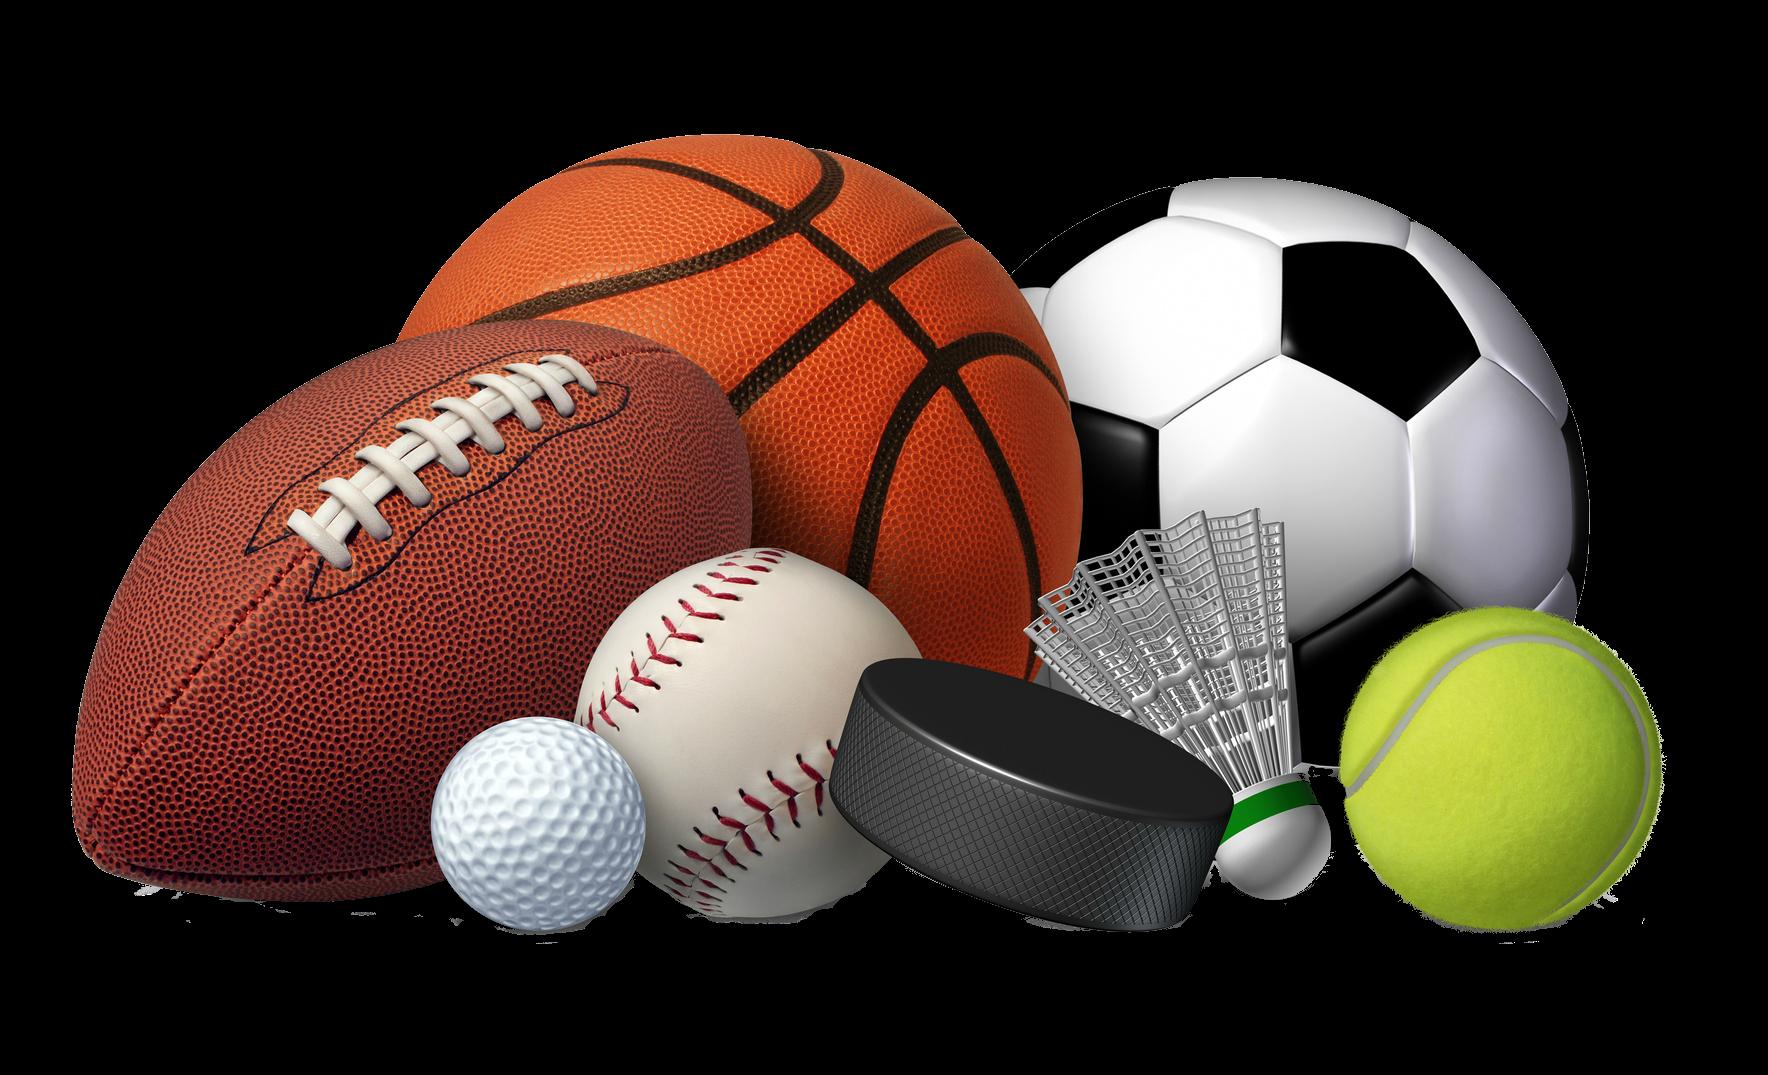 Smallthoughts Trivia Thursday Sports Trivia Questions Sport Management Sports Equipment